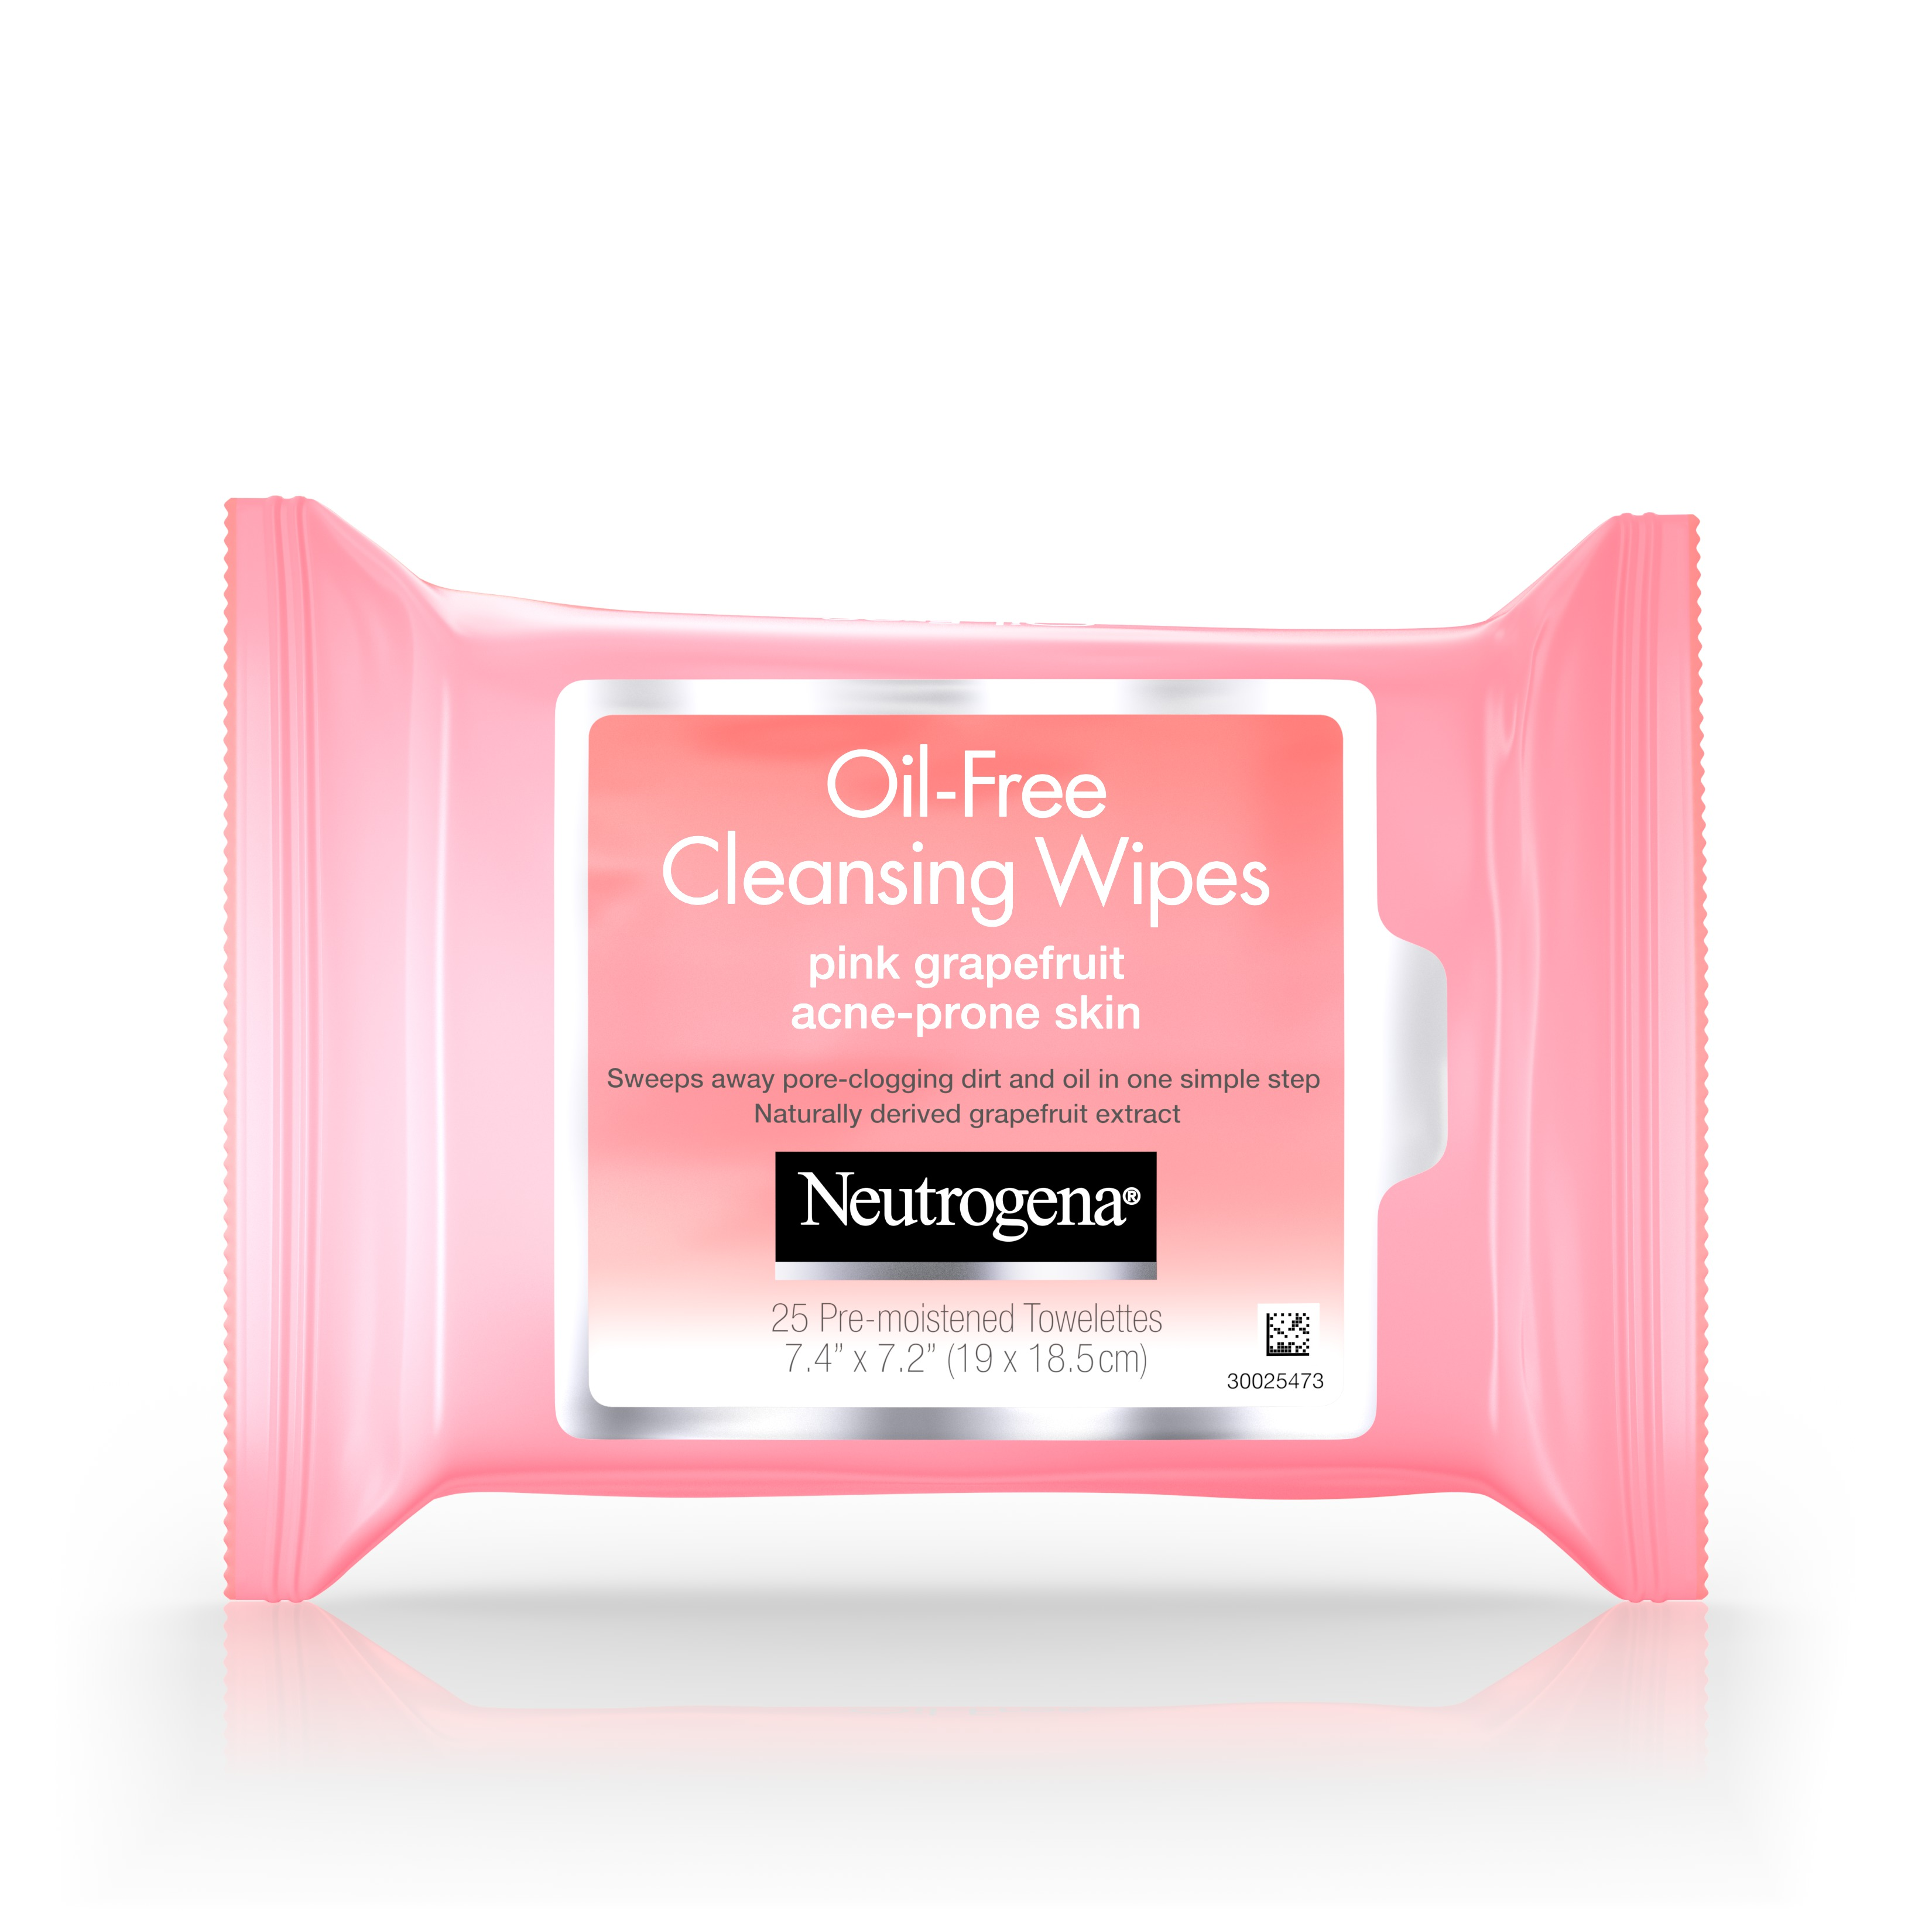 Neutrogena Oil-Free Cleansing Wipes, Pink Grapefruit, 25 Count - Walmart.com